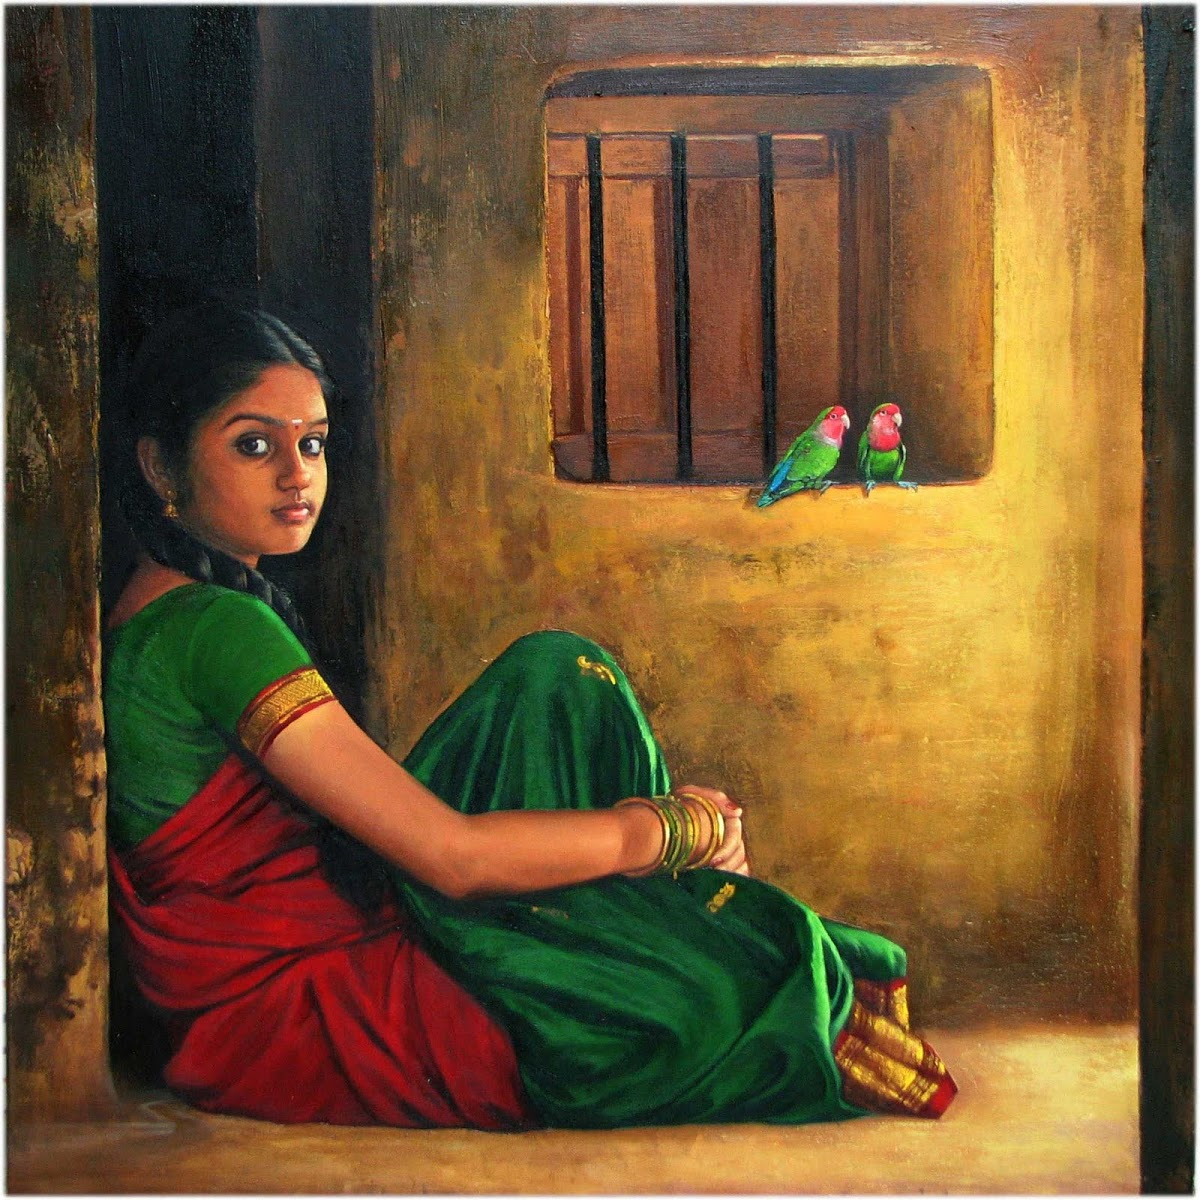 acrylic painting artwork girl tamilnadu by illayaraja